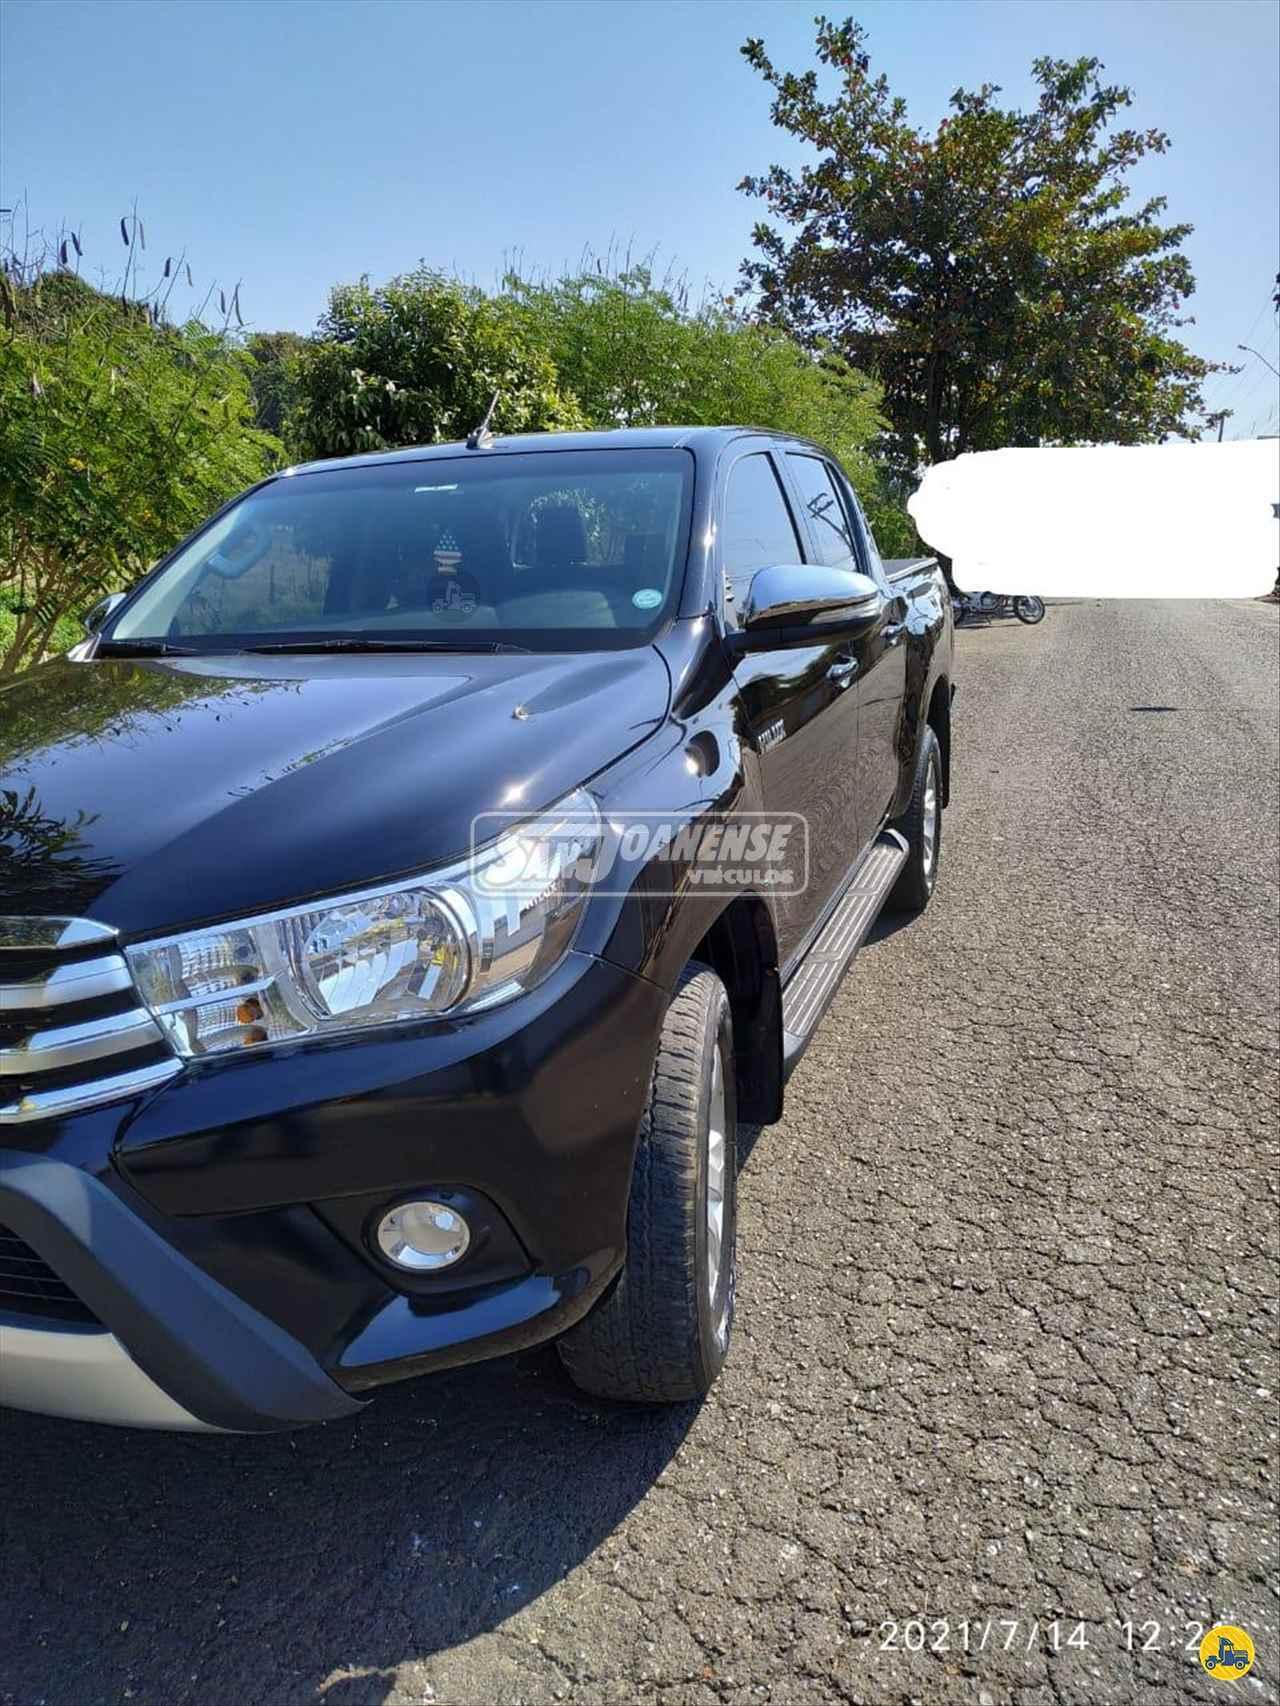 CARRO TOYOTA Hilux 2.8 SRV Sanjoanense Veículos SAO JOAO DA BOA VISTA SÃO PAULO SP